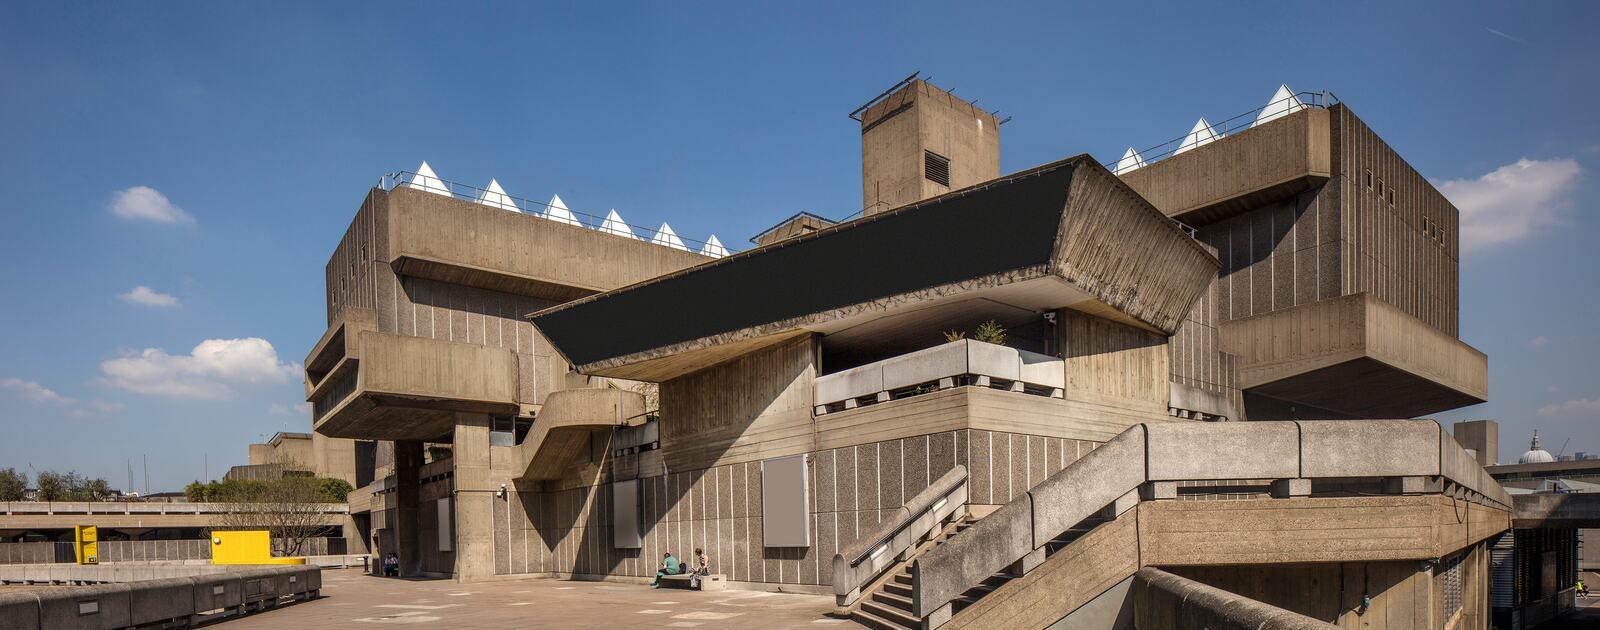 Hayward Gallery | Southbank Centre